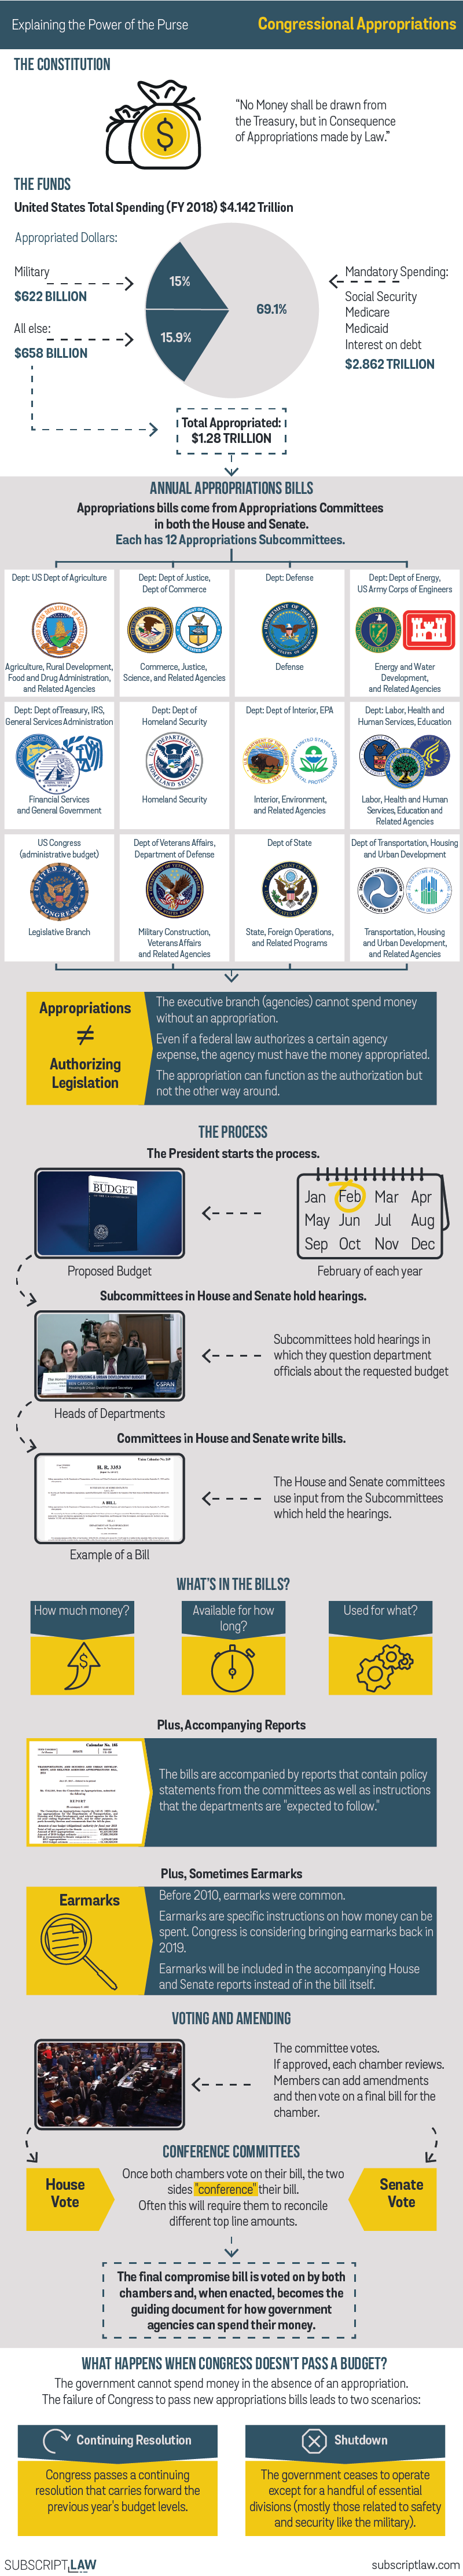 Congressional Budgeting